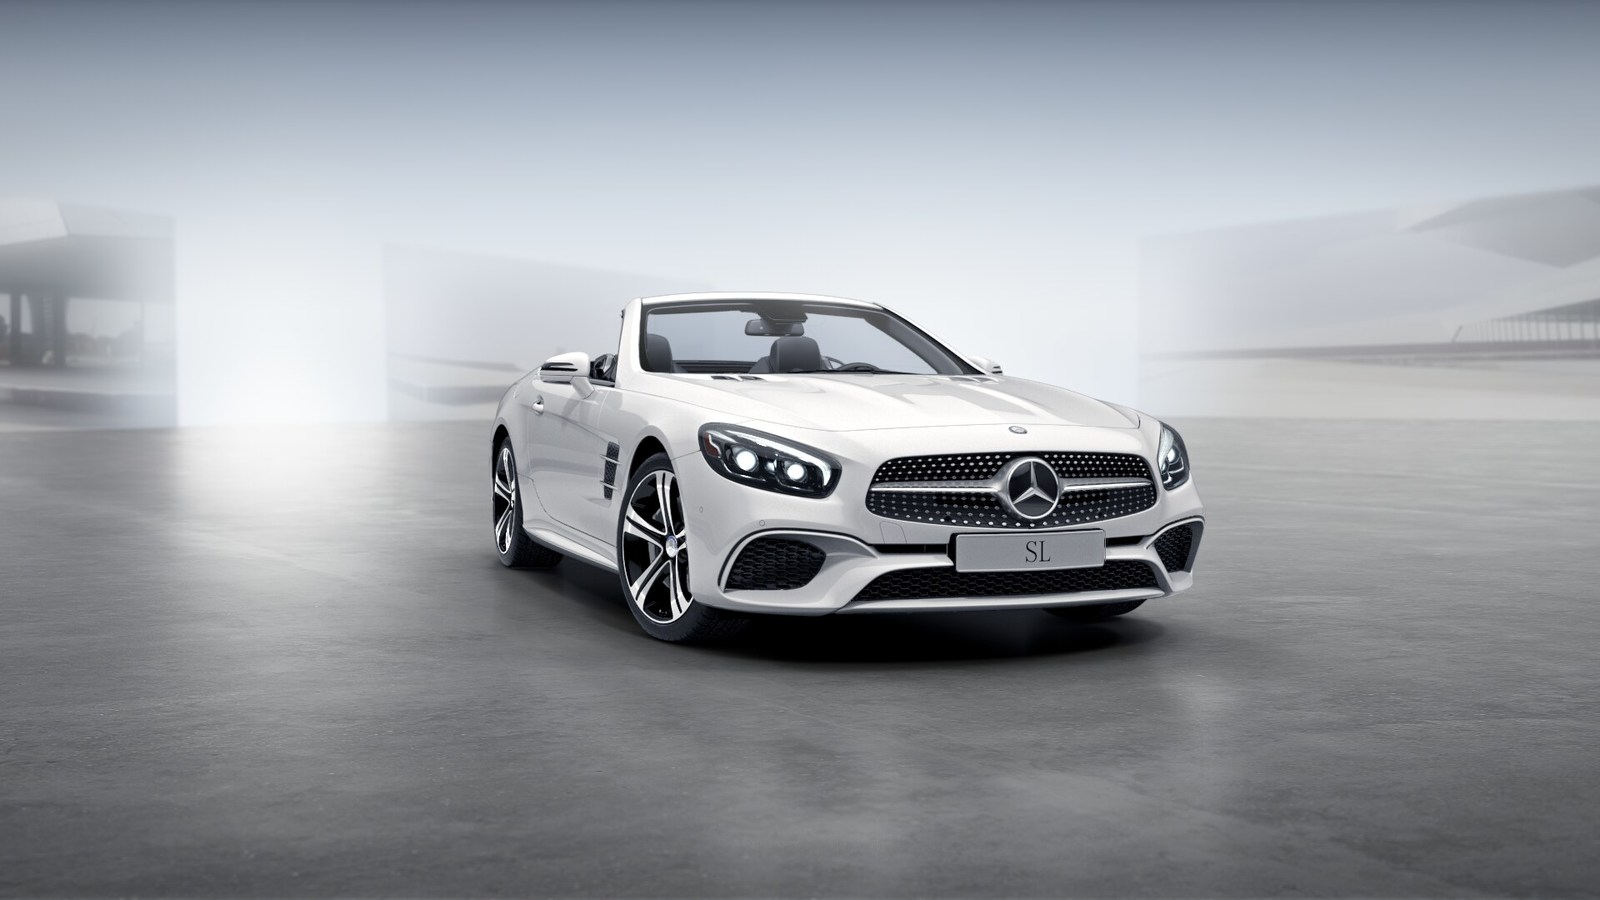 New 2017 mercedes benz sl class sl450 2 door coupe for Mercedes benz sl550